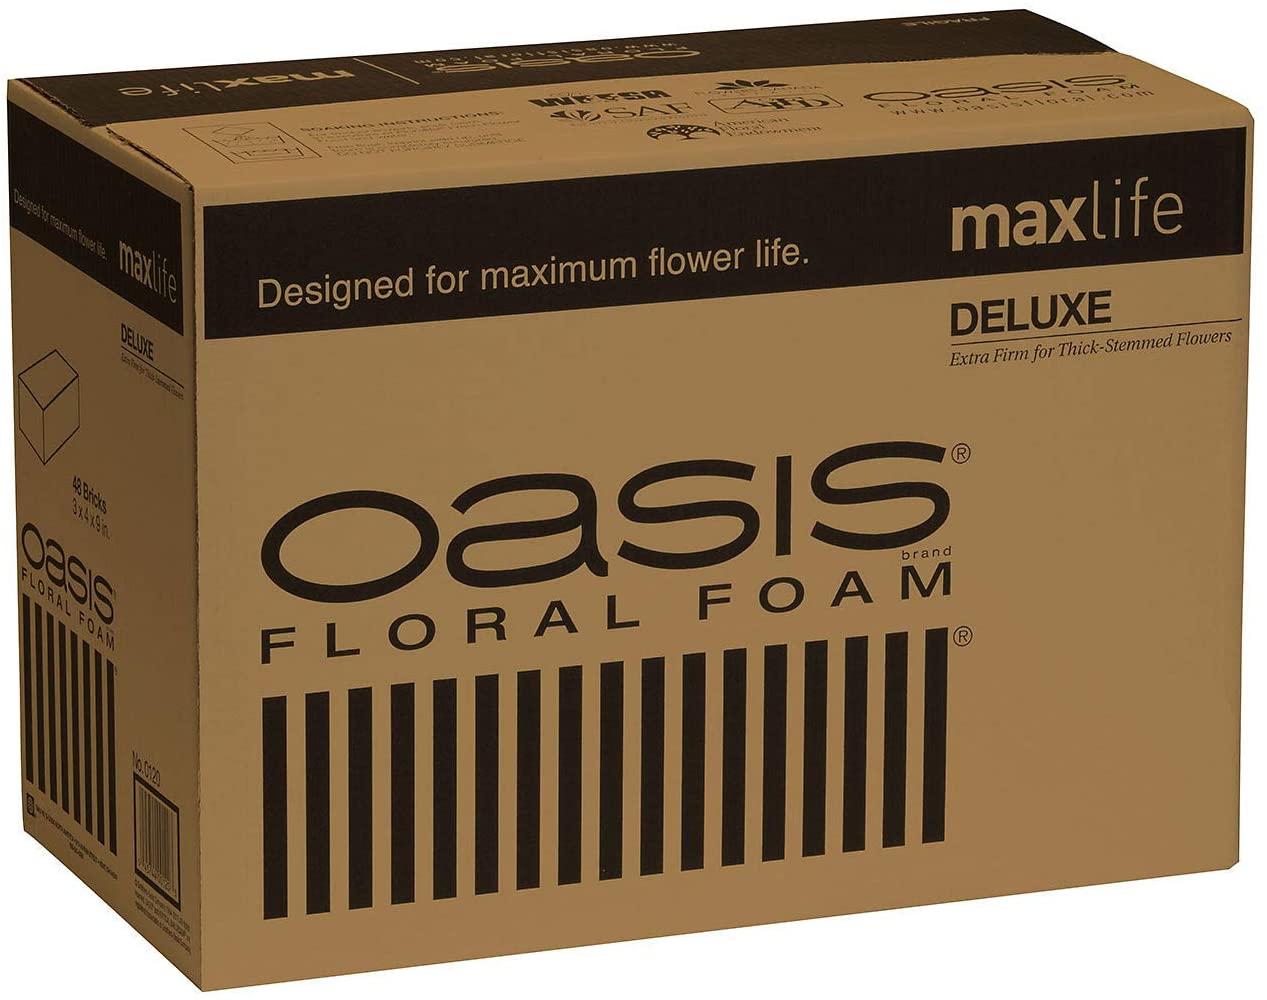 Oasis Deluxe Floral Foam Bricks - Case of 48 - Maxlife Floral Foam - Wet Floral Foam Bricks for Flower Arranging